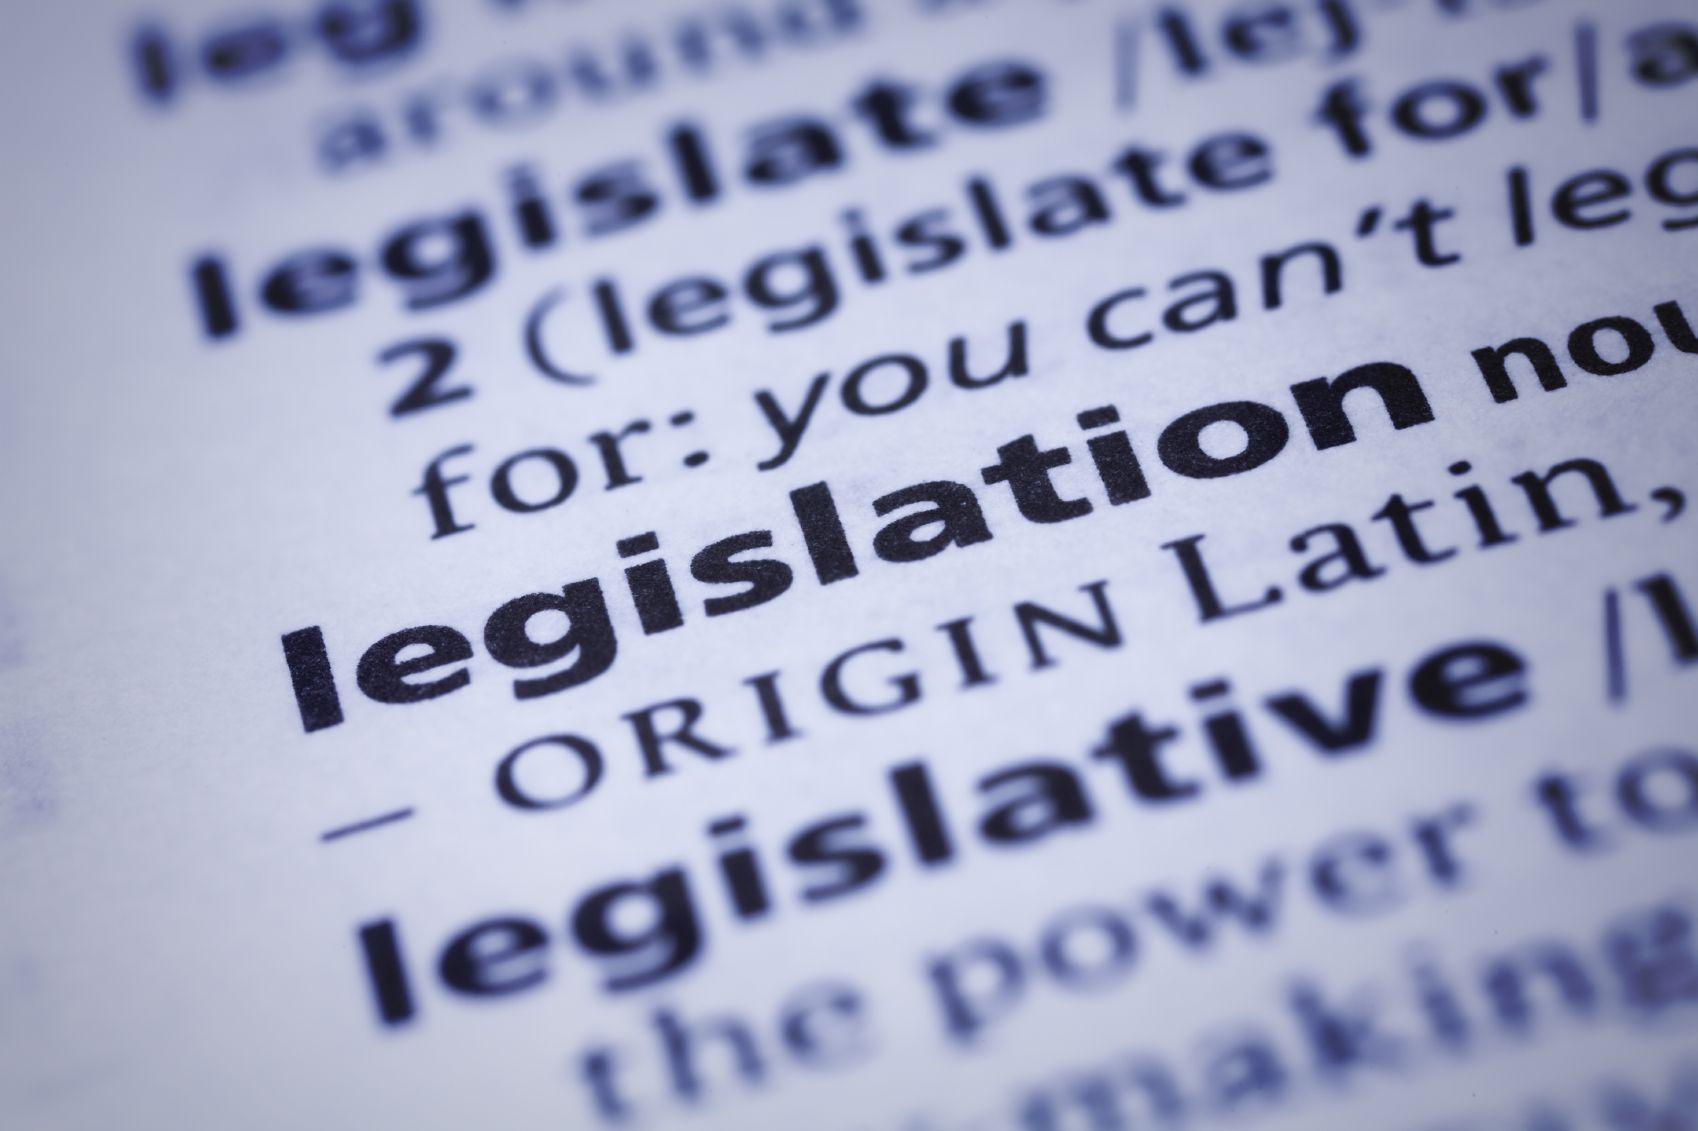 teletravail legislation